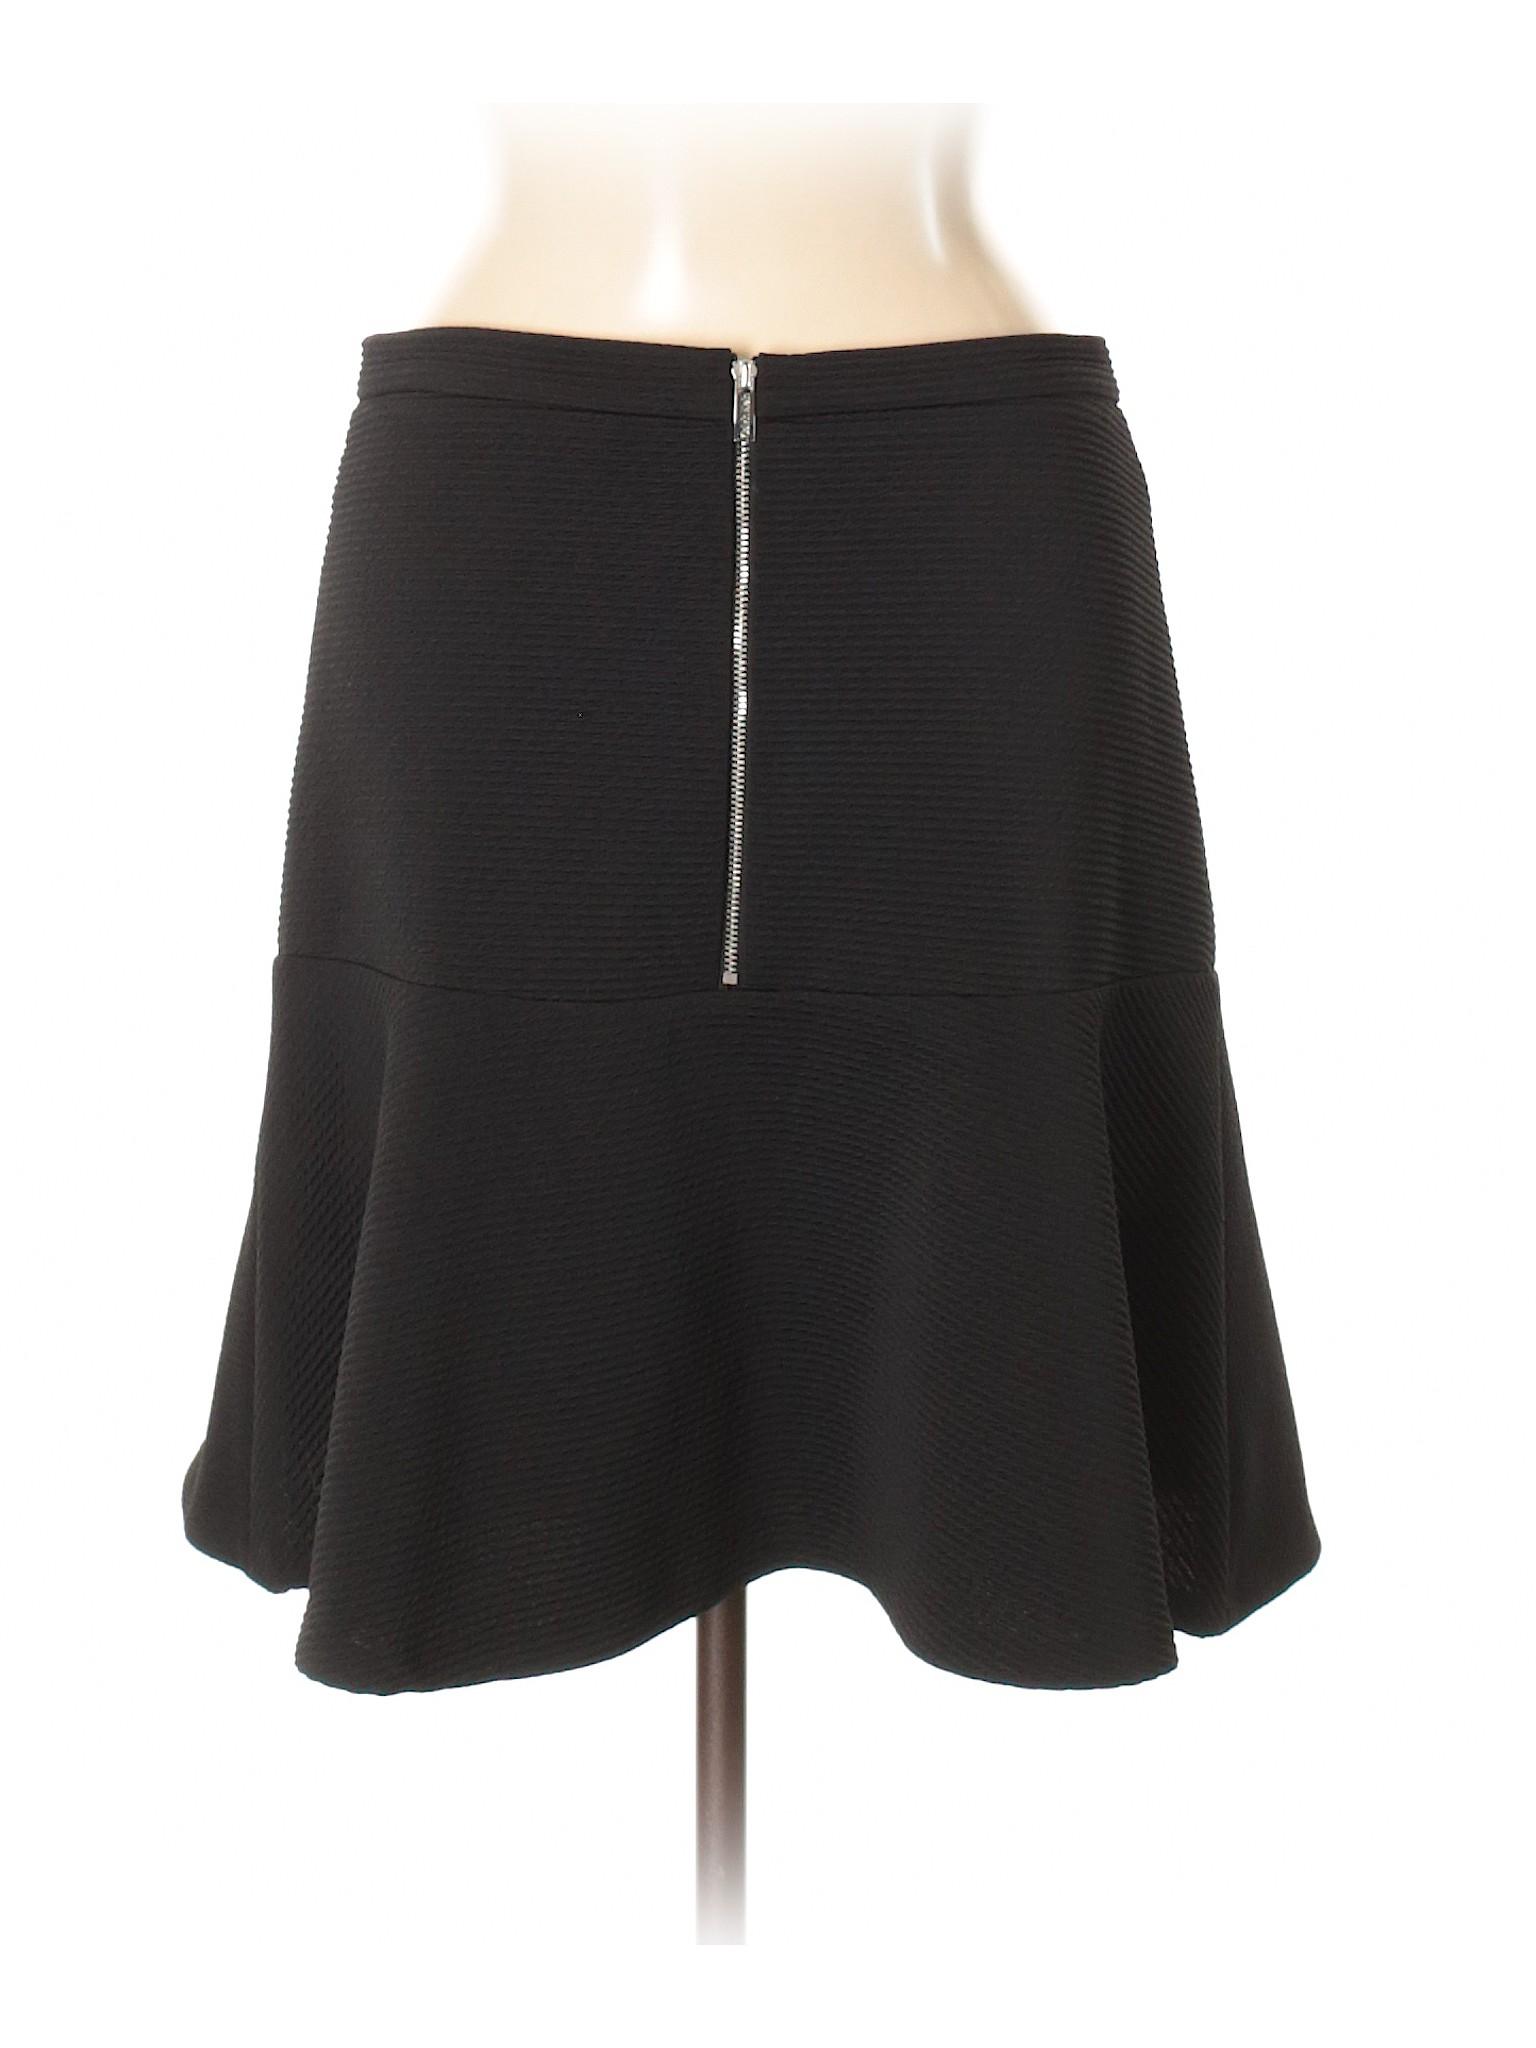 Casual Calvin Klein Leisure Skirt winter Ow5qxq1Et